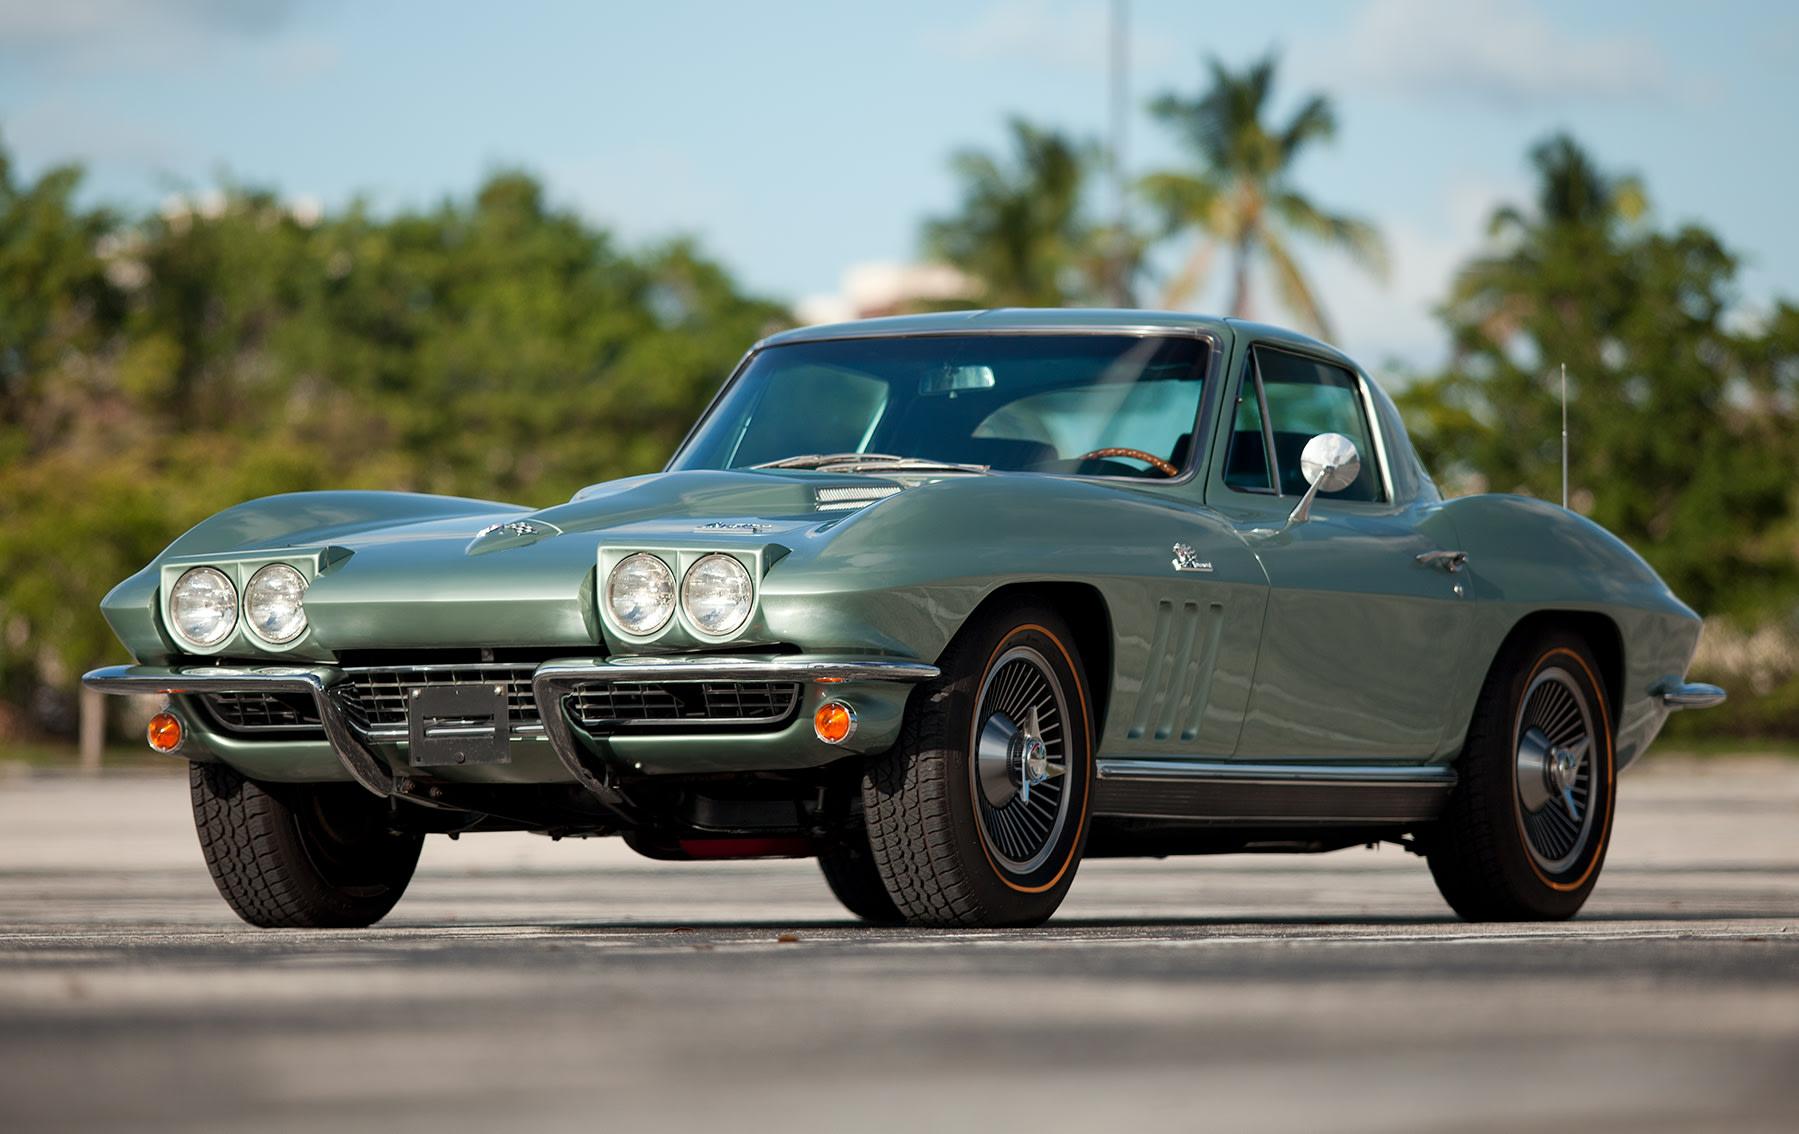 1966 Chevrolet Corvette 427/390 HP Coupe